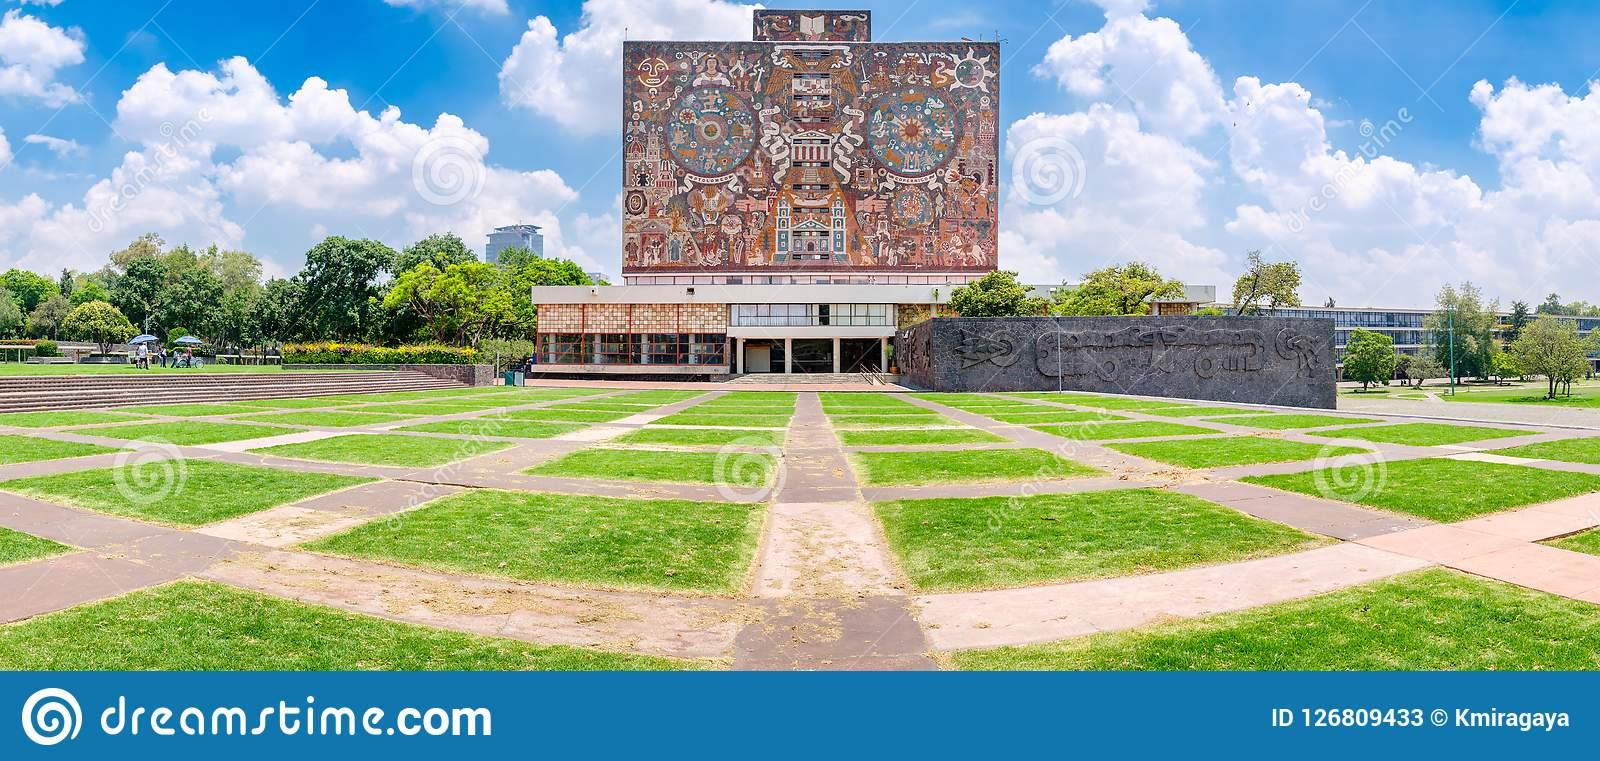 La universidad autónoma nacional de México